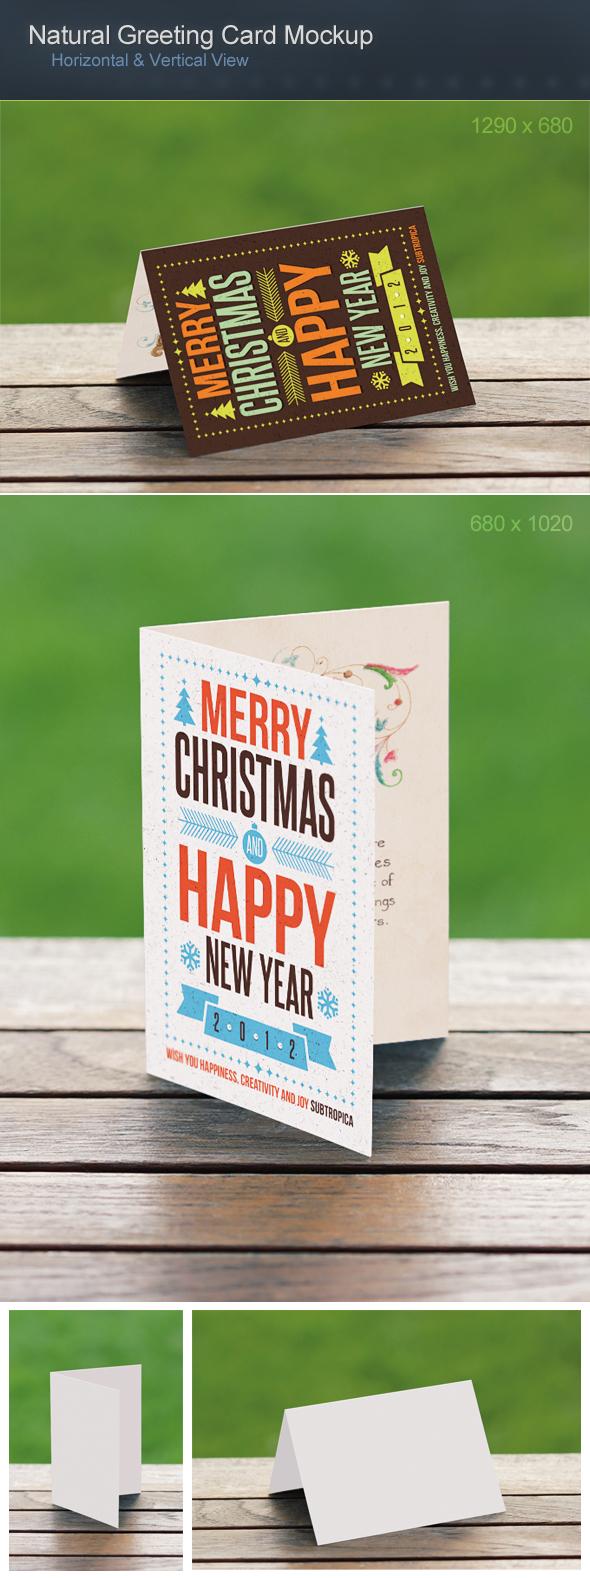 Natural Greeting Card Mockup by h3design